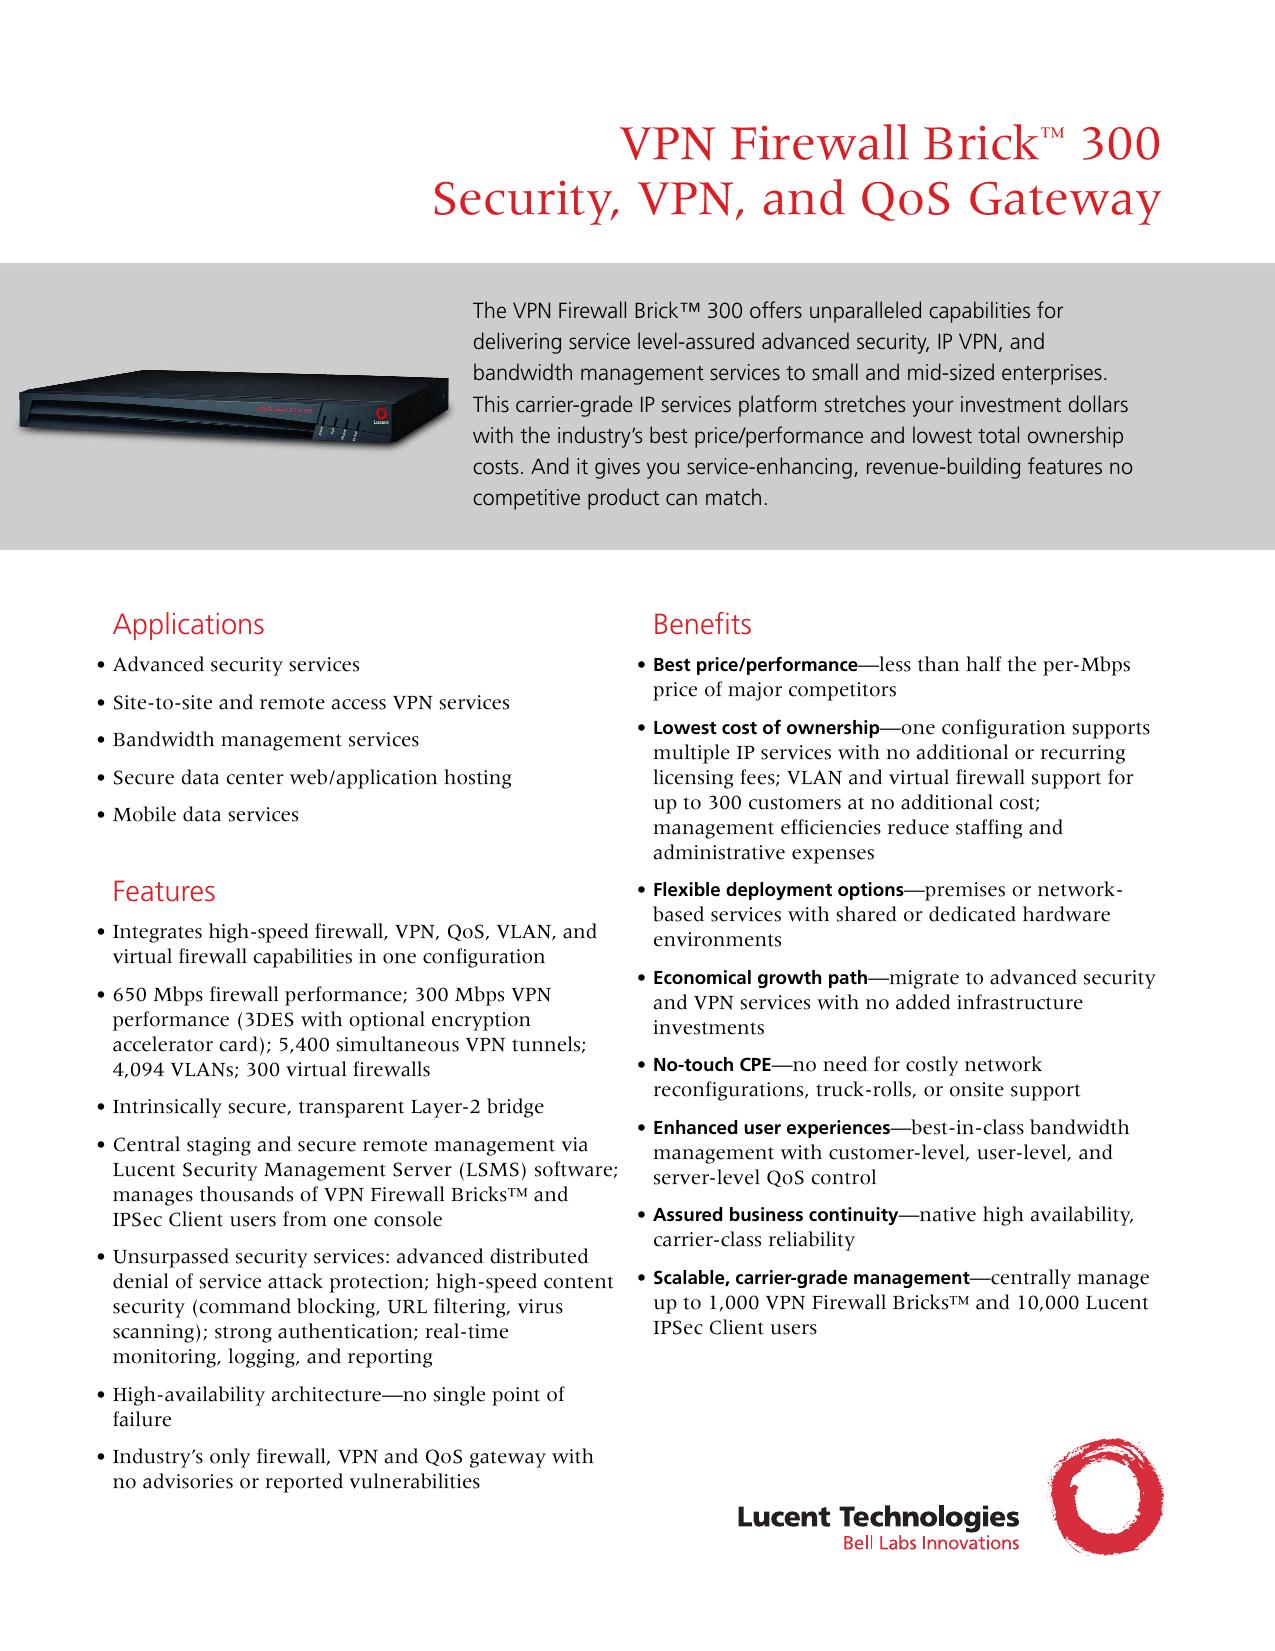 Alcatel-Lucent VPN Firewall Brick 150